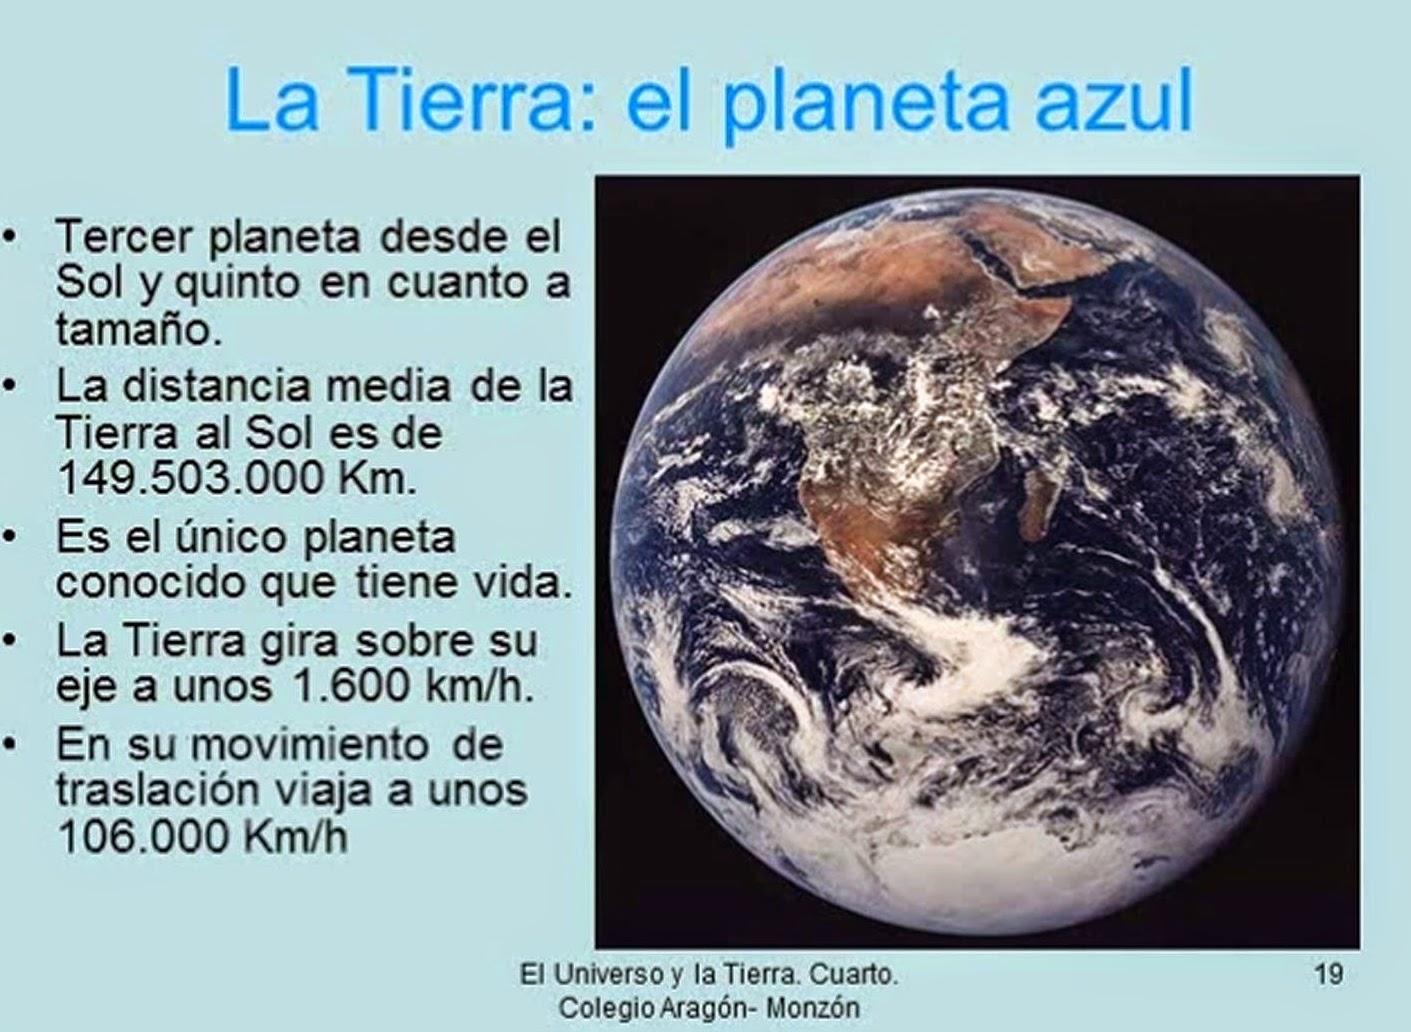 http://ciclomedioaragonmonzon.blogspot.com.es/search/label/Planeta%20Tierra